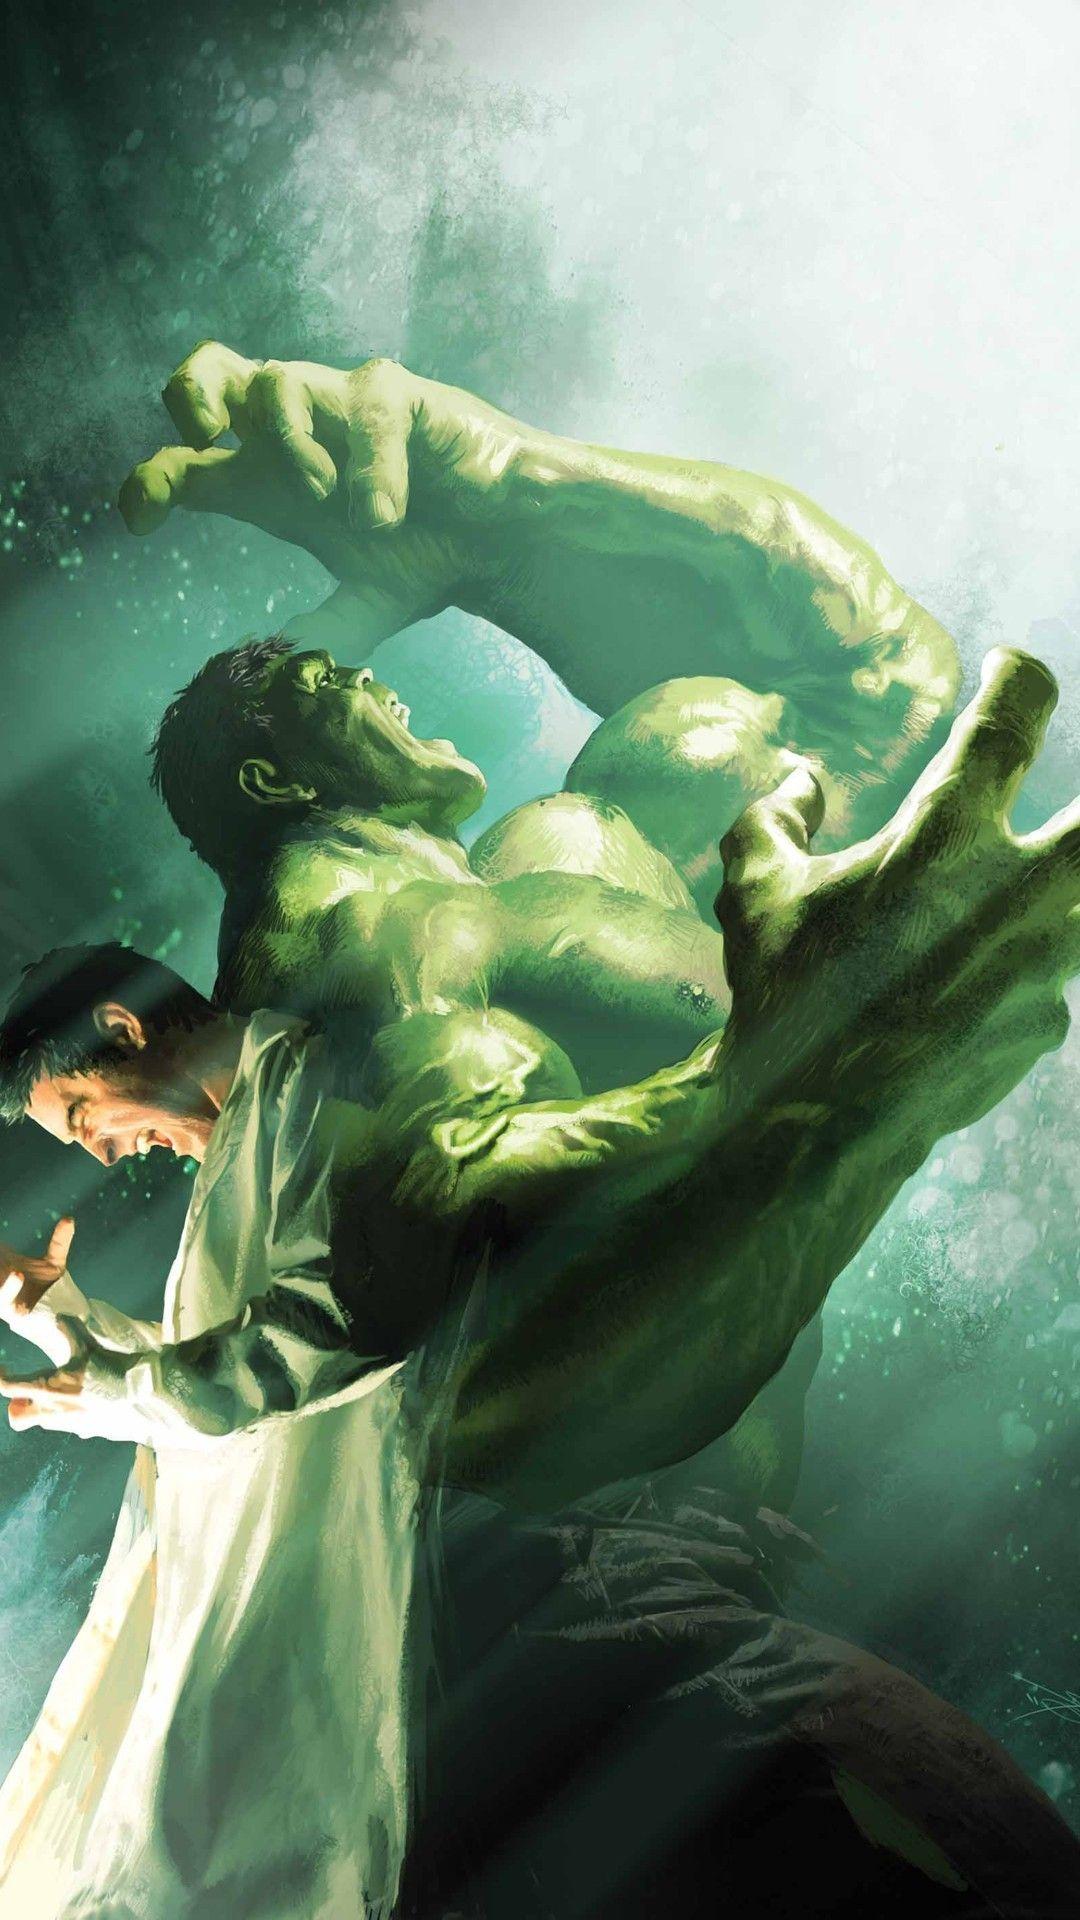 Bruce Banner Turning Into The Hulk Mobile Wallpaper 5433